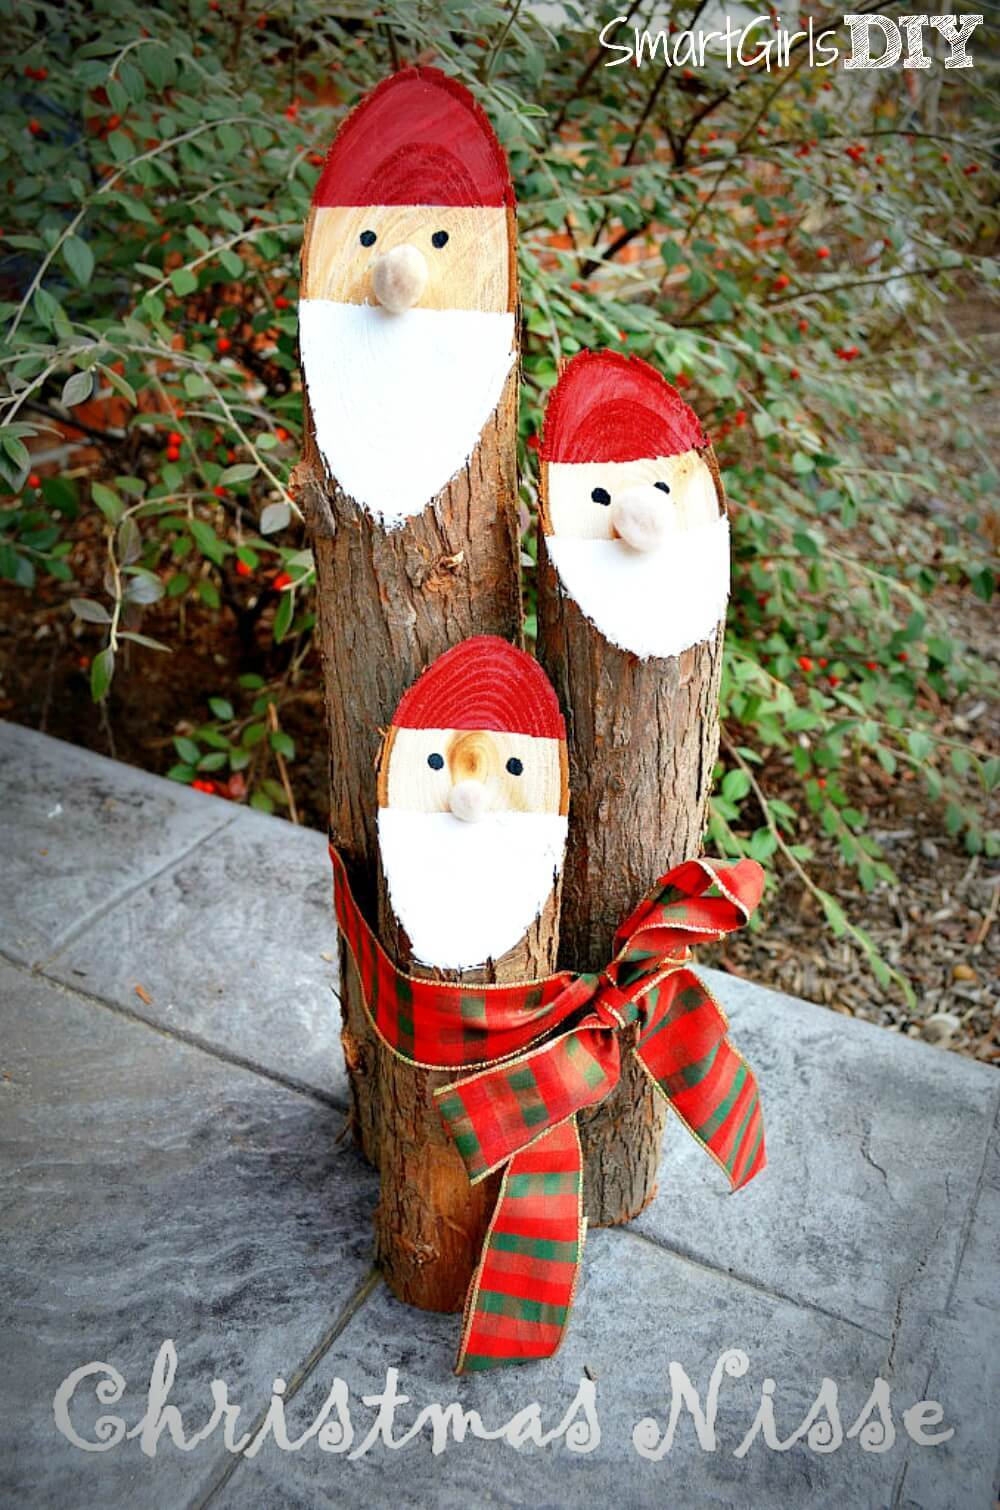 DIY ChristmasSantaLog Decoration Instructions - Raw Wood Logs and Stumps DIY Ideas Projects